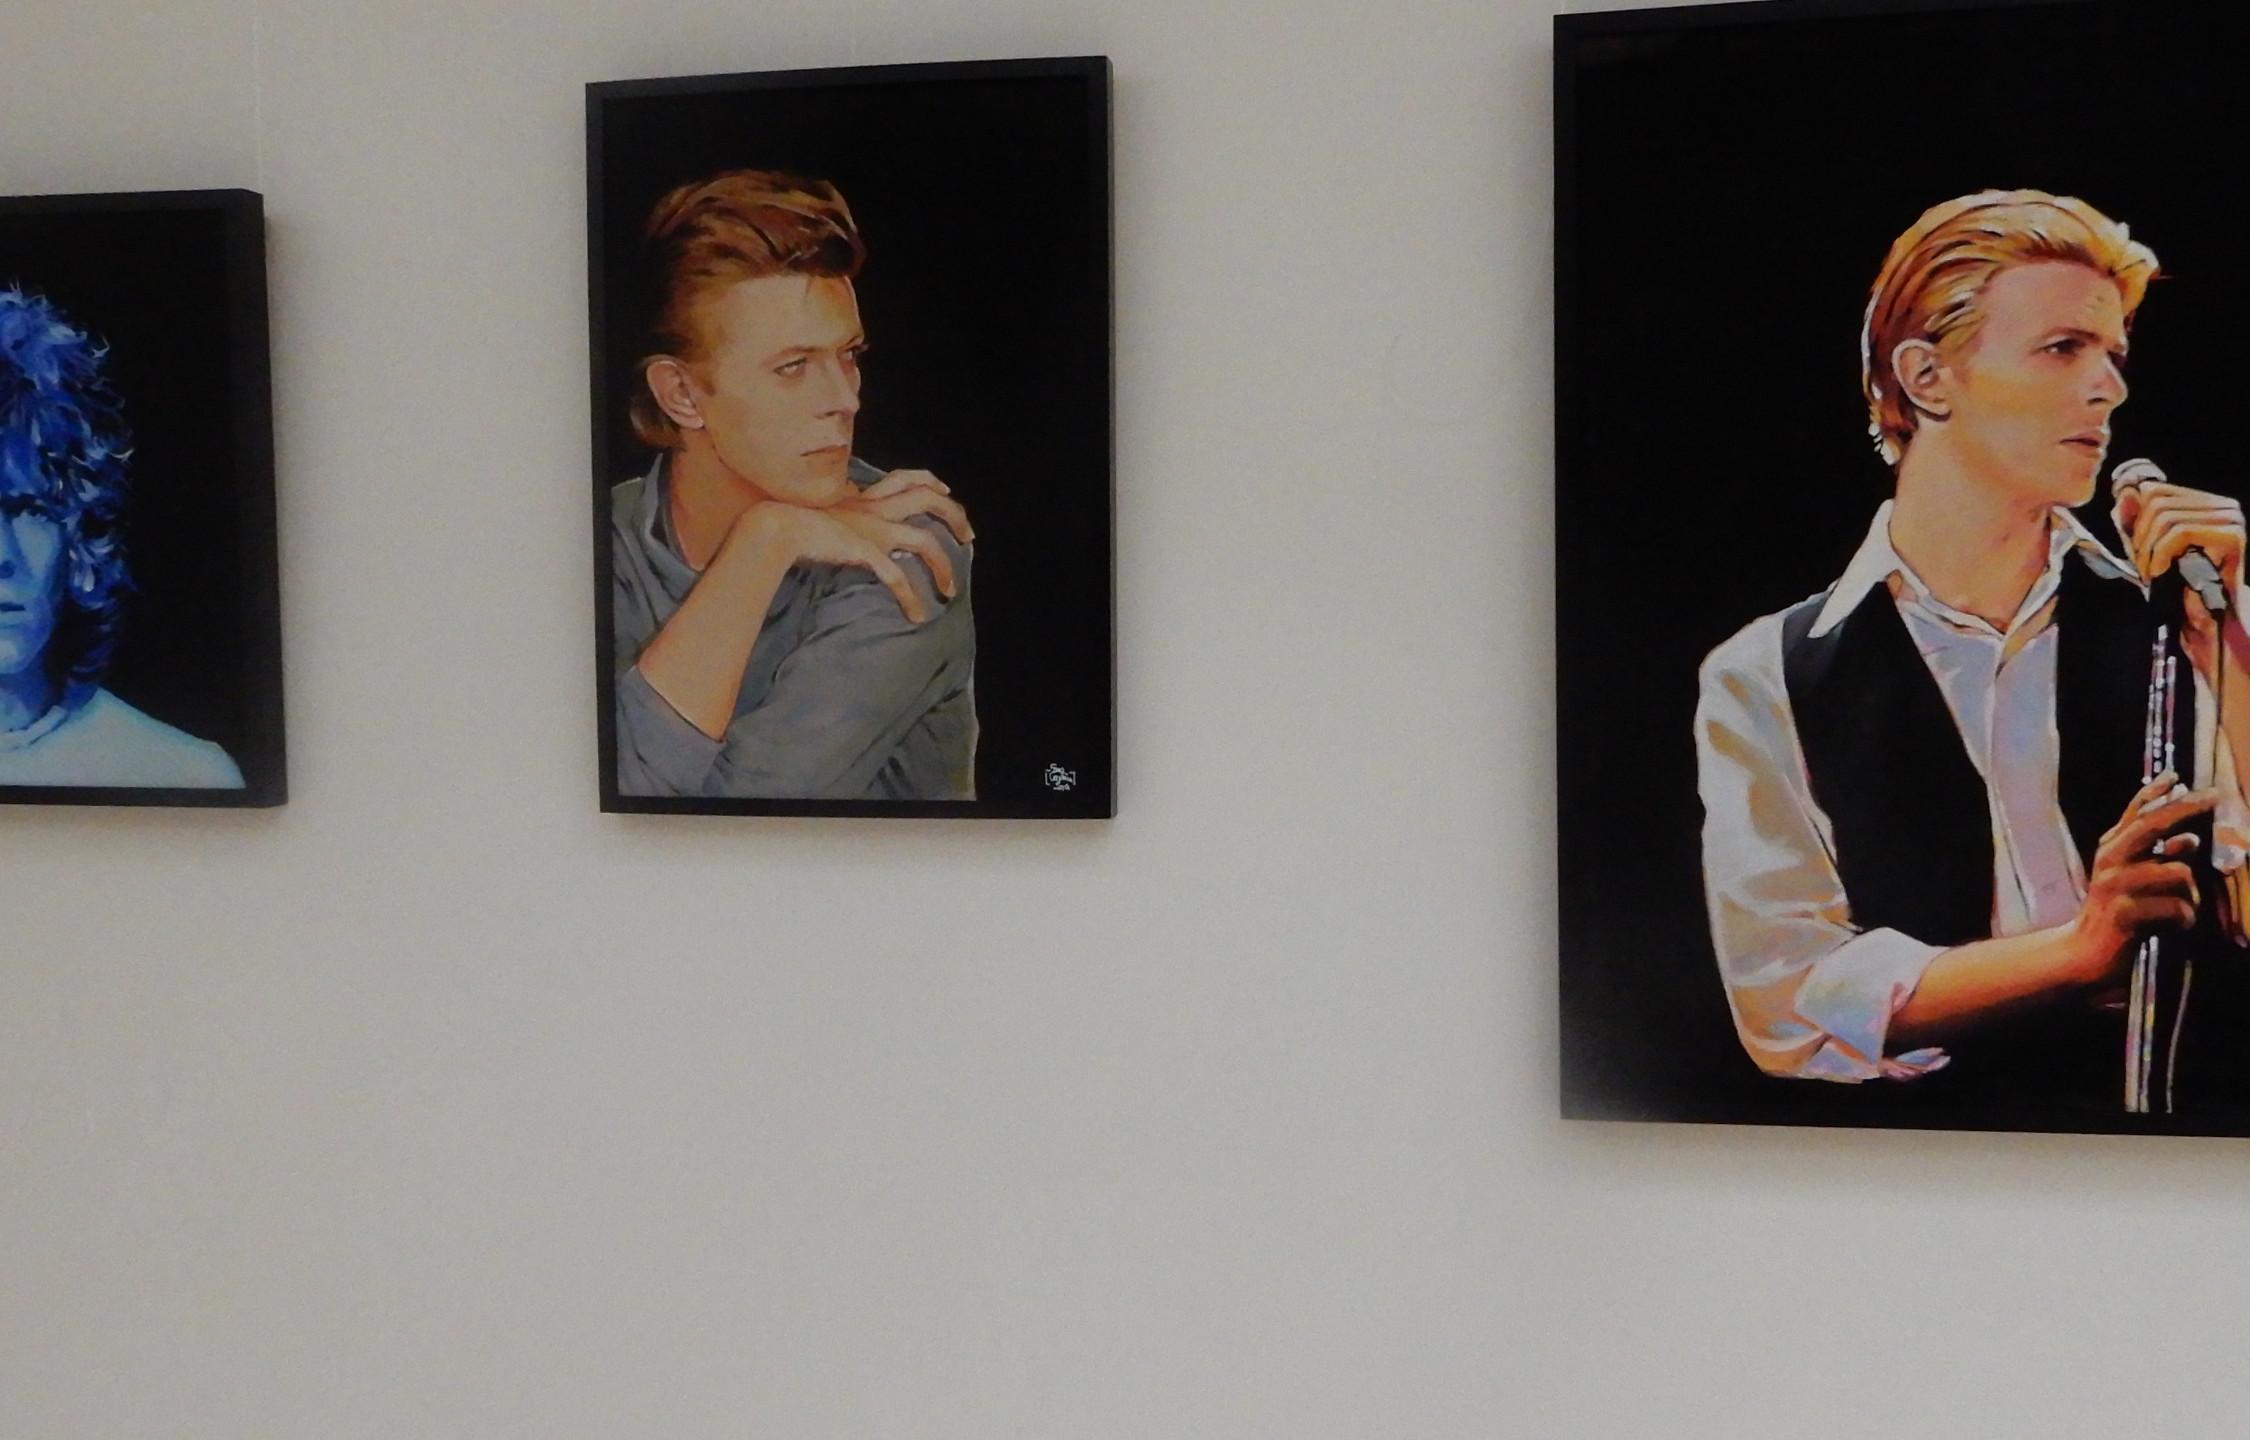 David Bowie art by Sara Captain